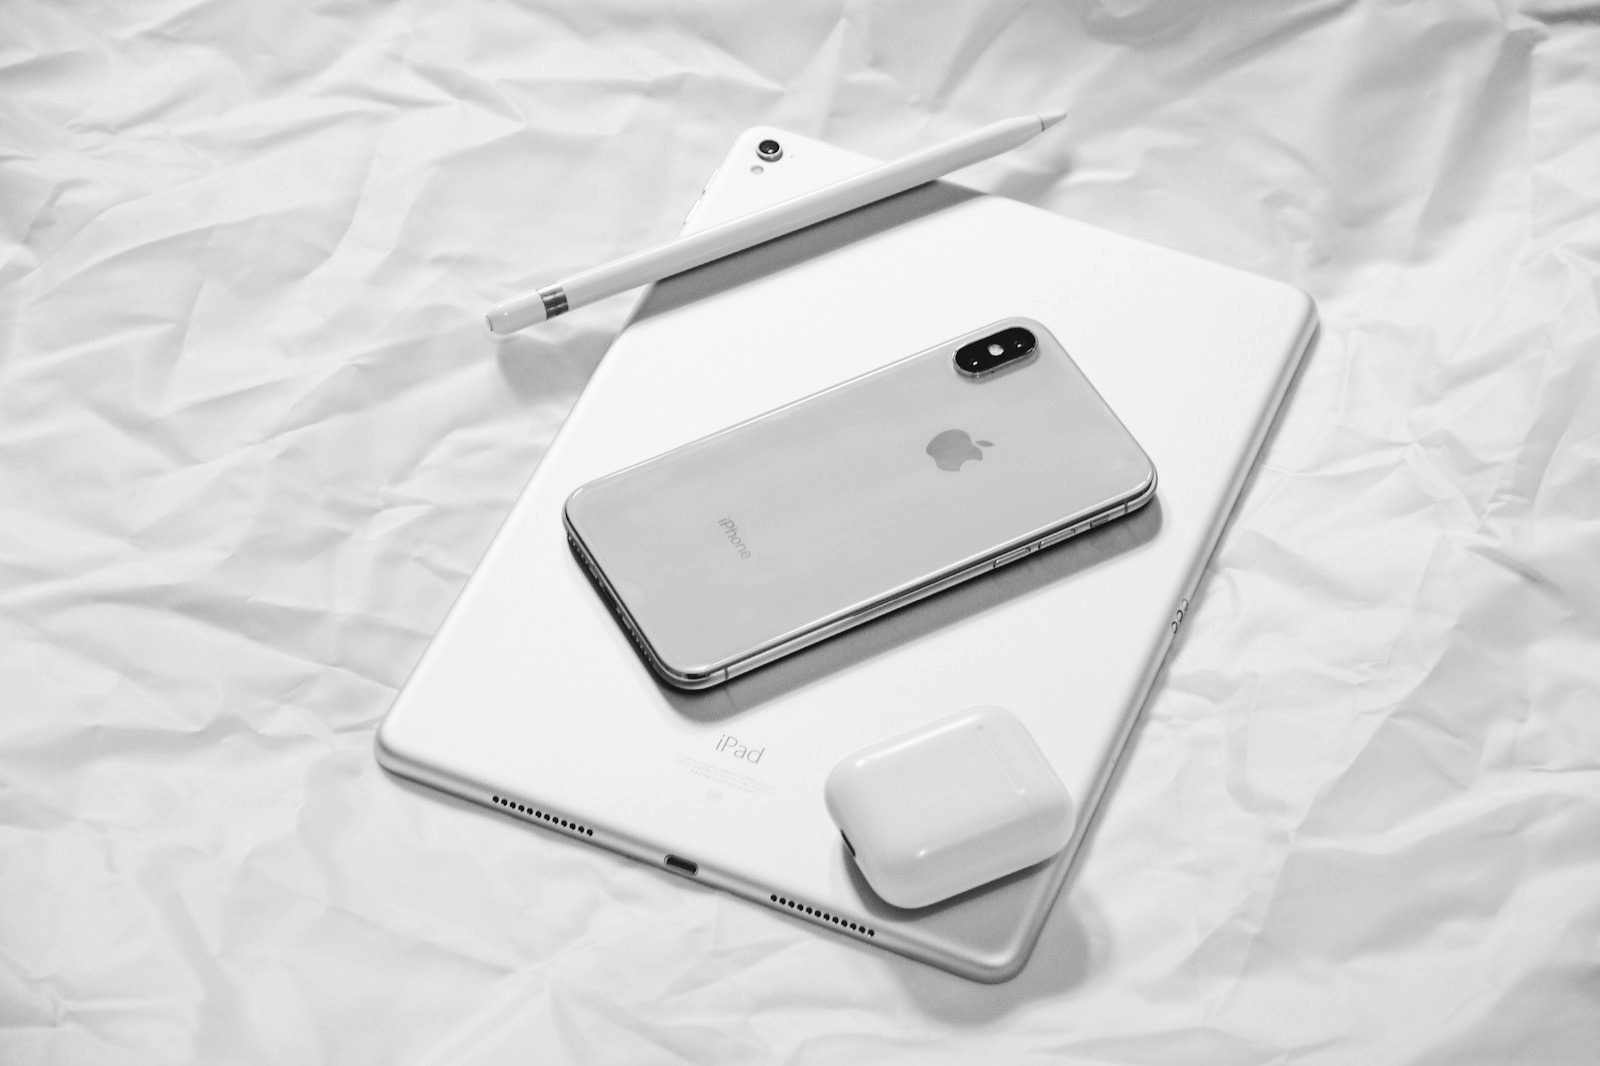 eleven-x-517447-unsplash-ipadpro-applepencil-iphonex-airpods.jpg